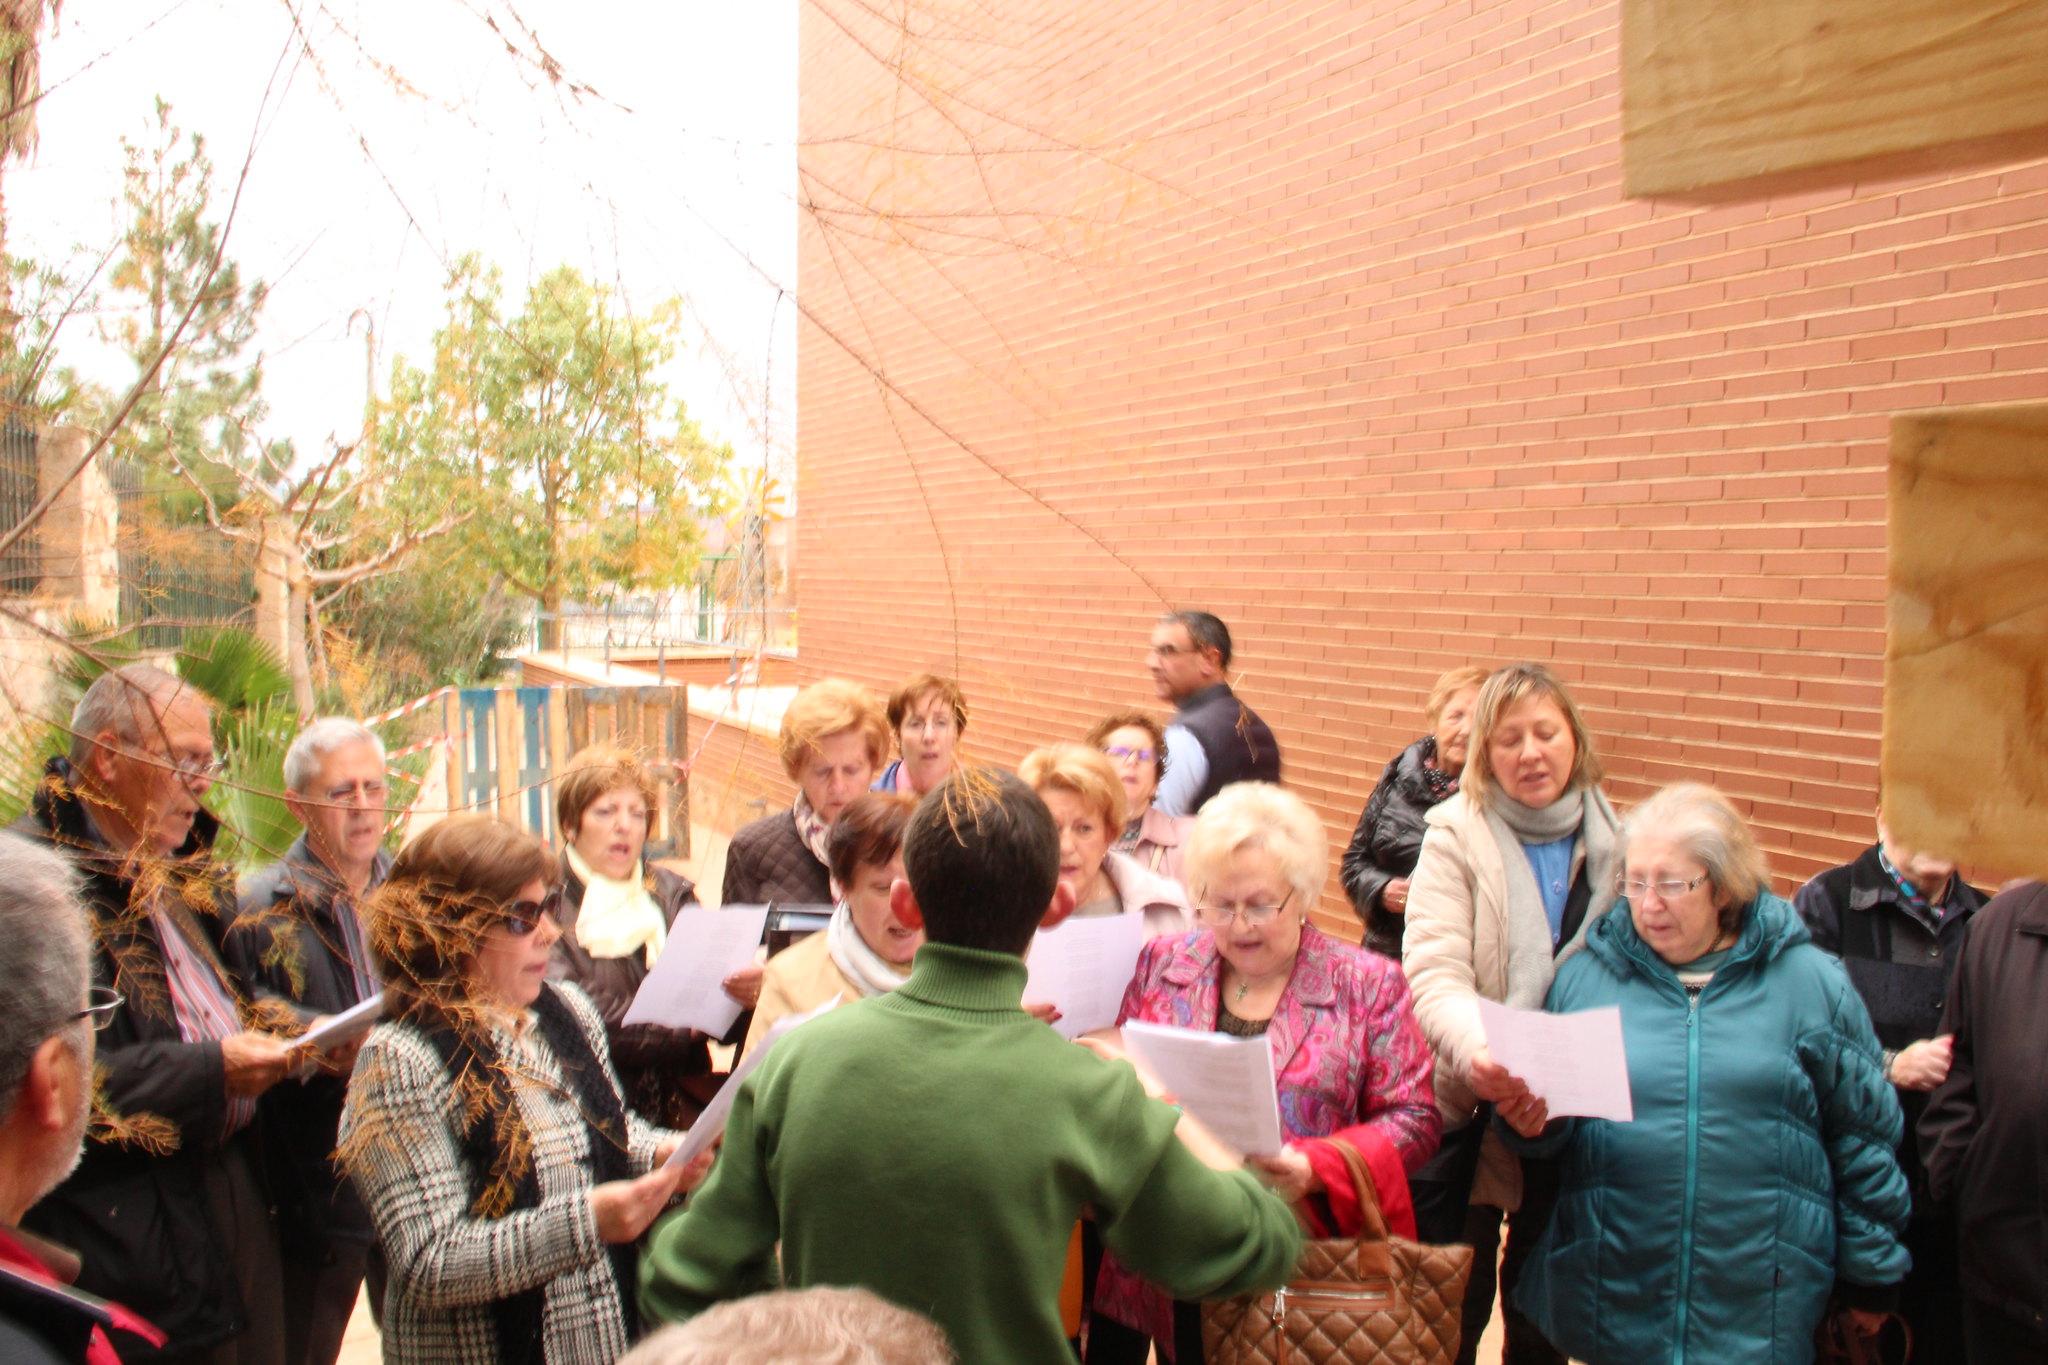 (2016-02-13) - Inauguración Virgen De Lourdes, La Molineta - Archivo La Molineta (092)